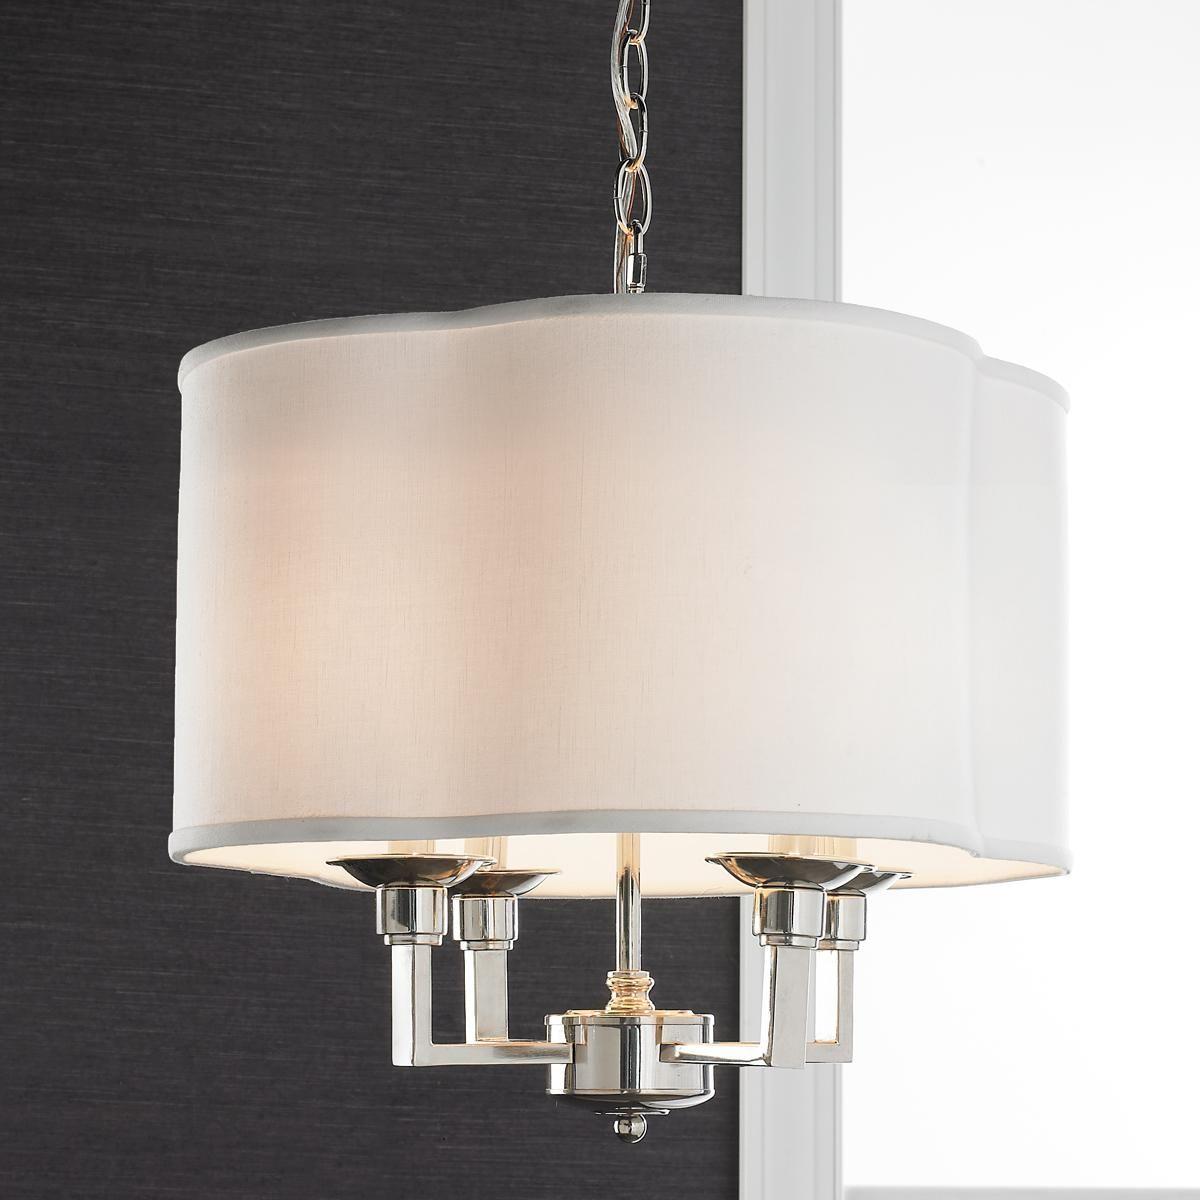 Quatrefoil shade mini chandelier mini chandelier quatrefoil and quatrefoil shade mini chandelier arubaitofo Choice Image